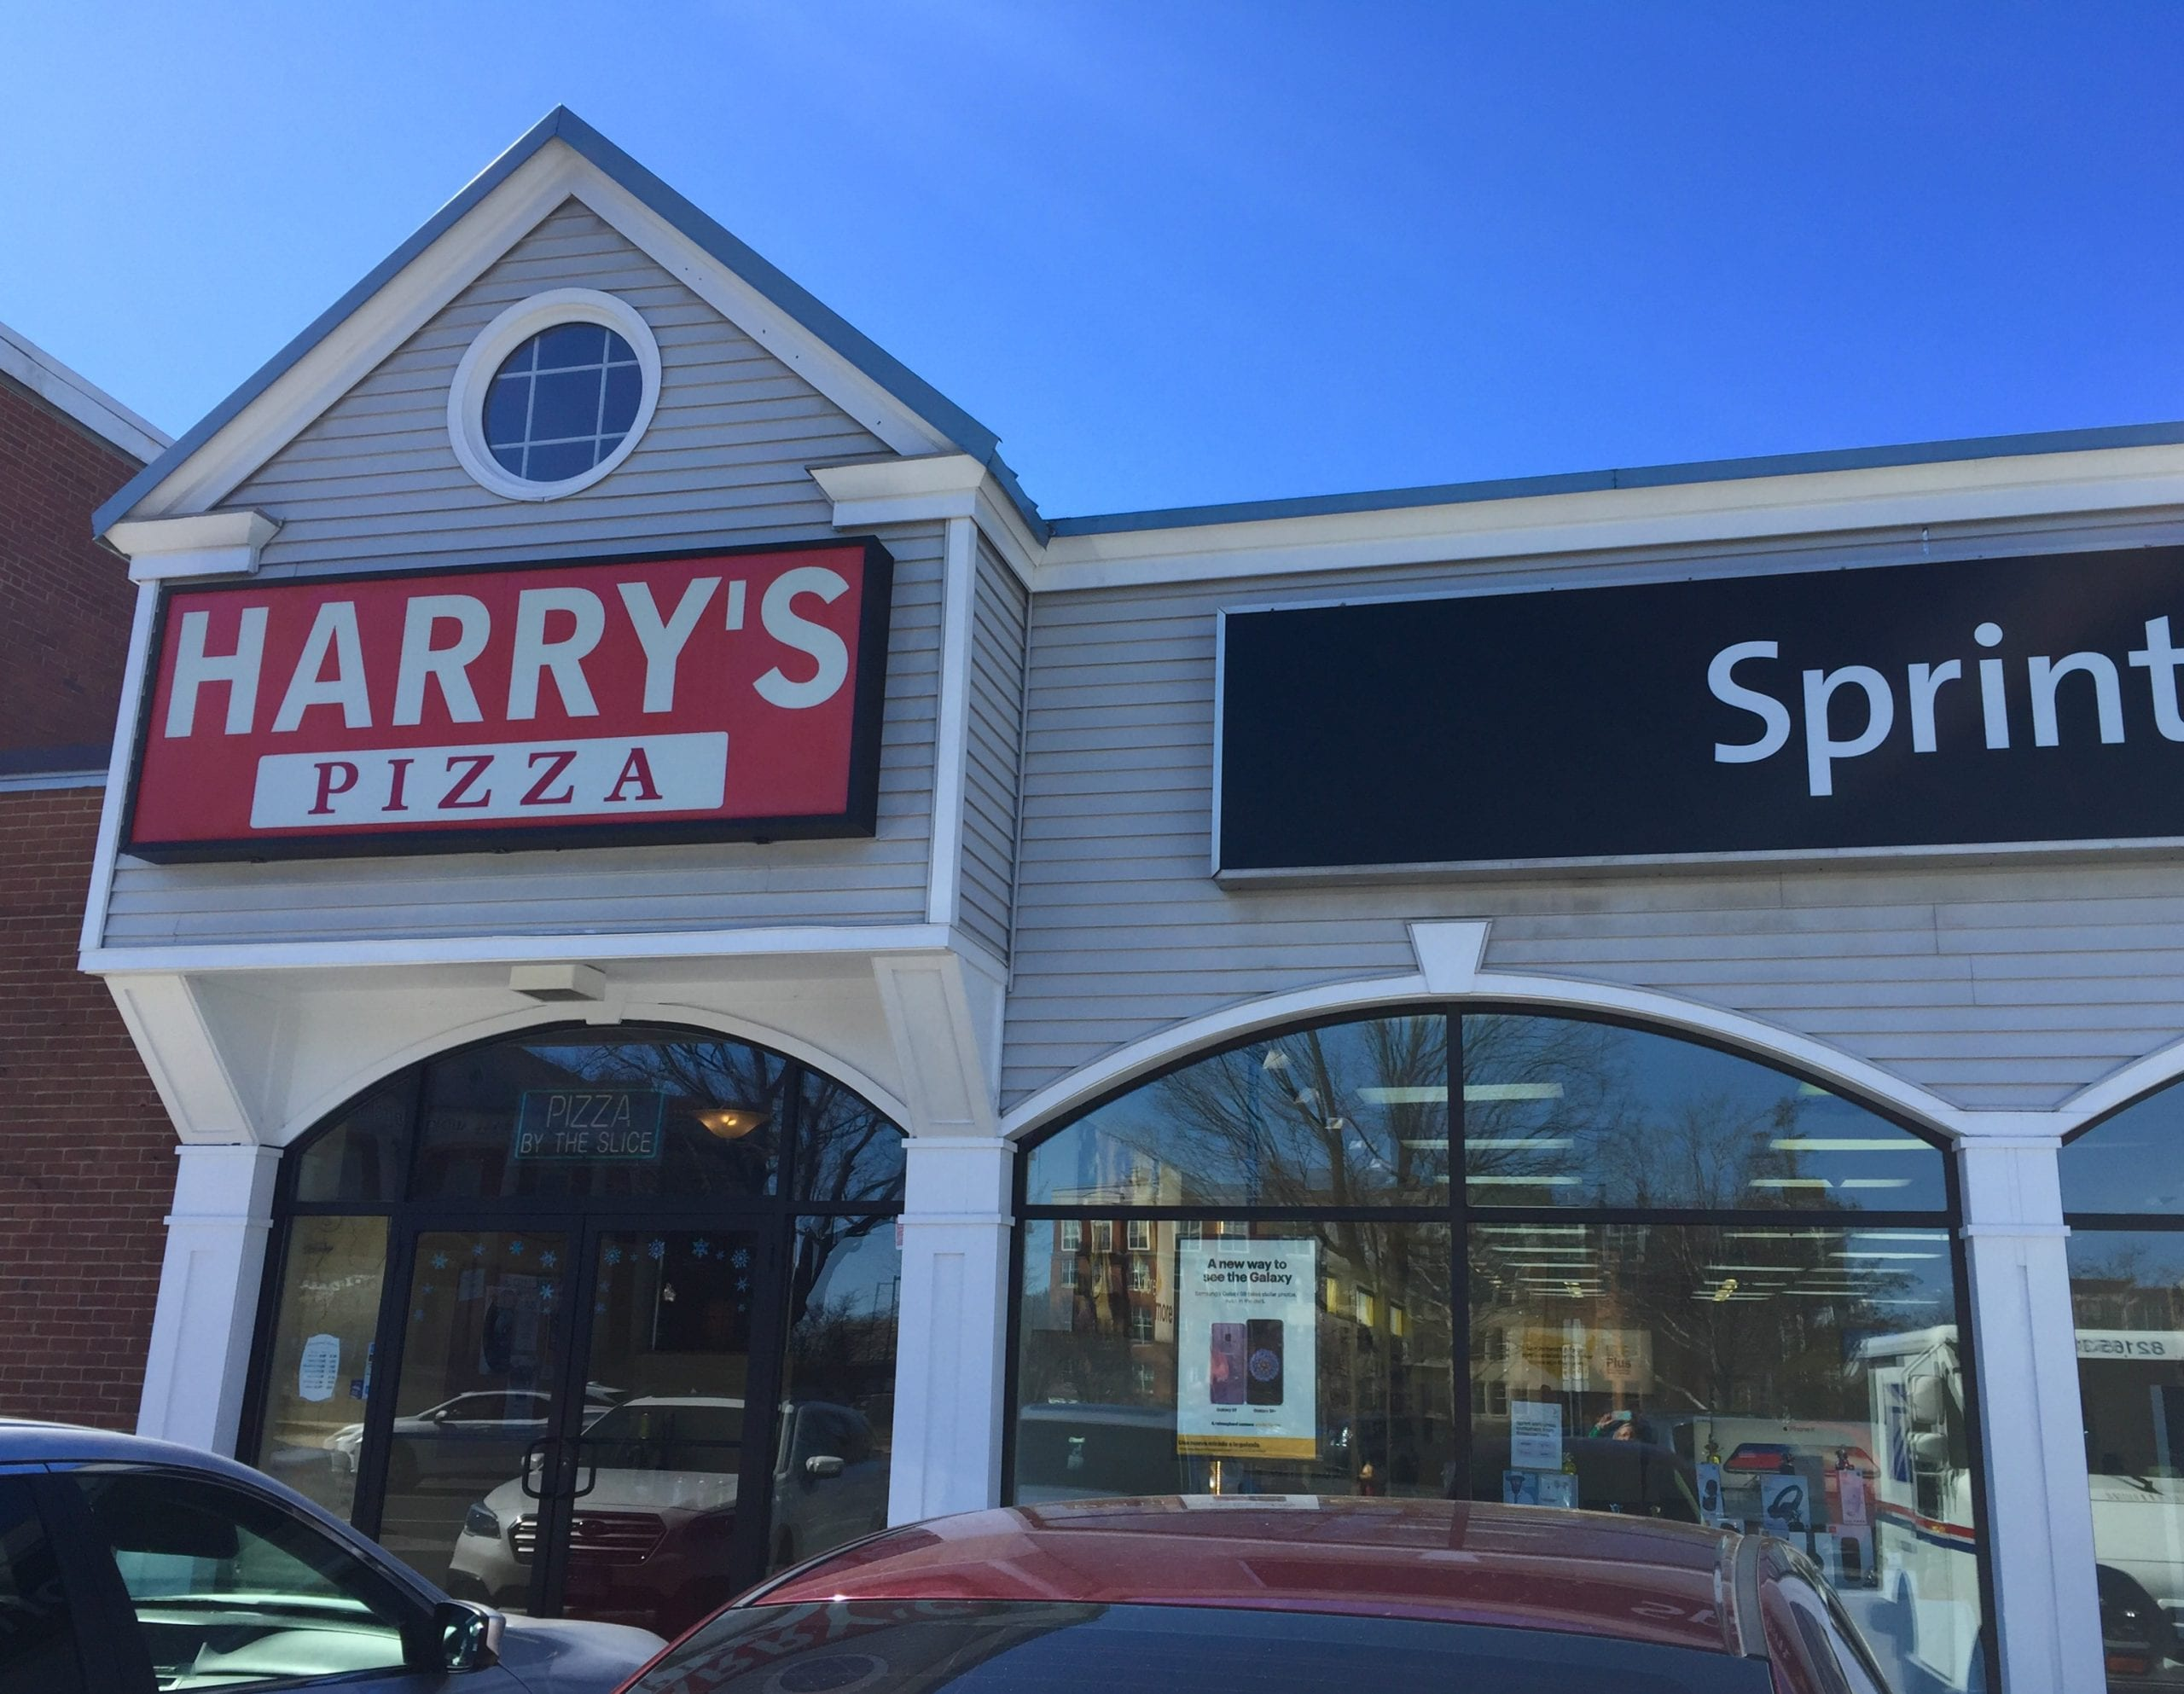 west hartford business buzz: march 19, 2018 - we-ha   west